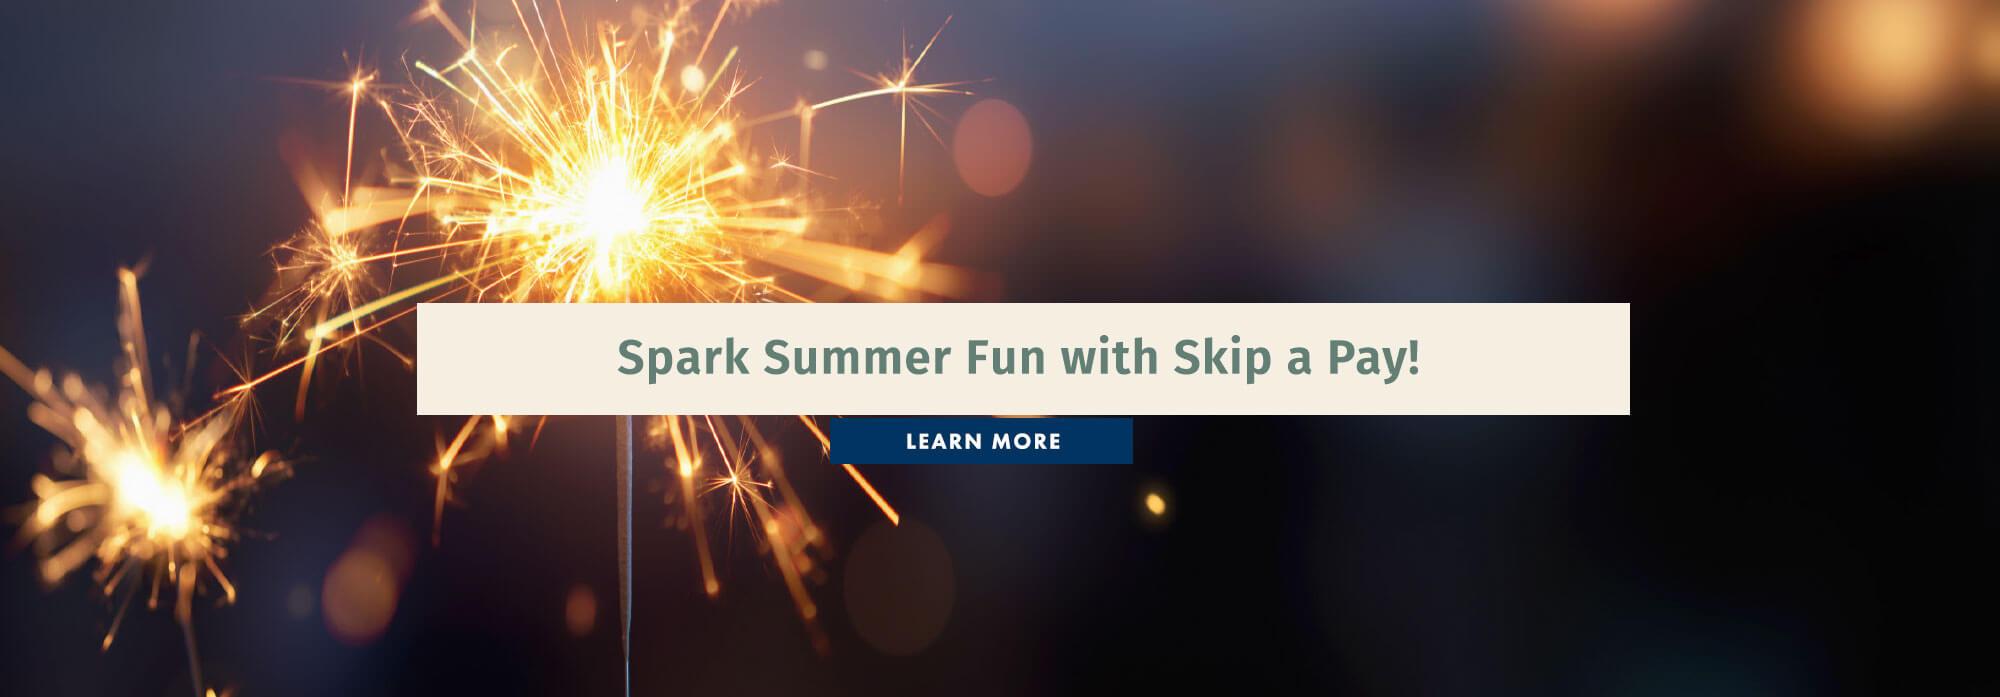 Spark Summer Fun with Skip a Pay!